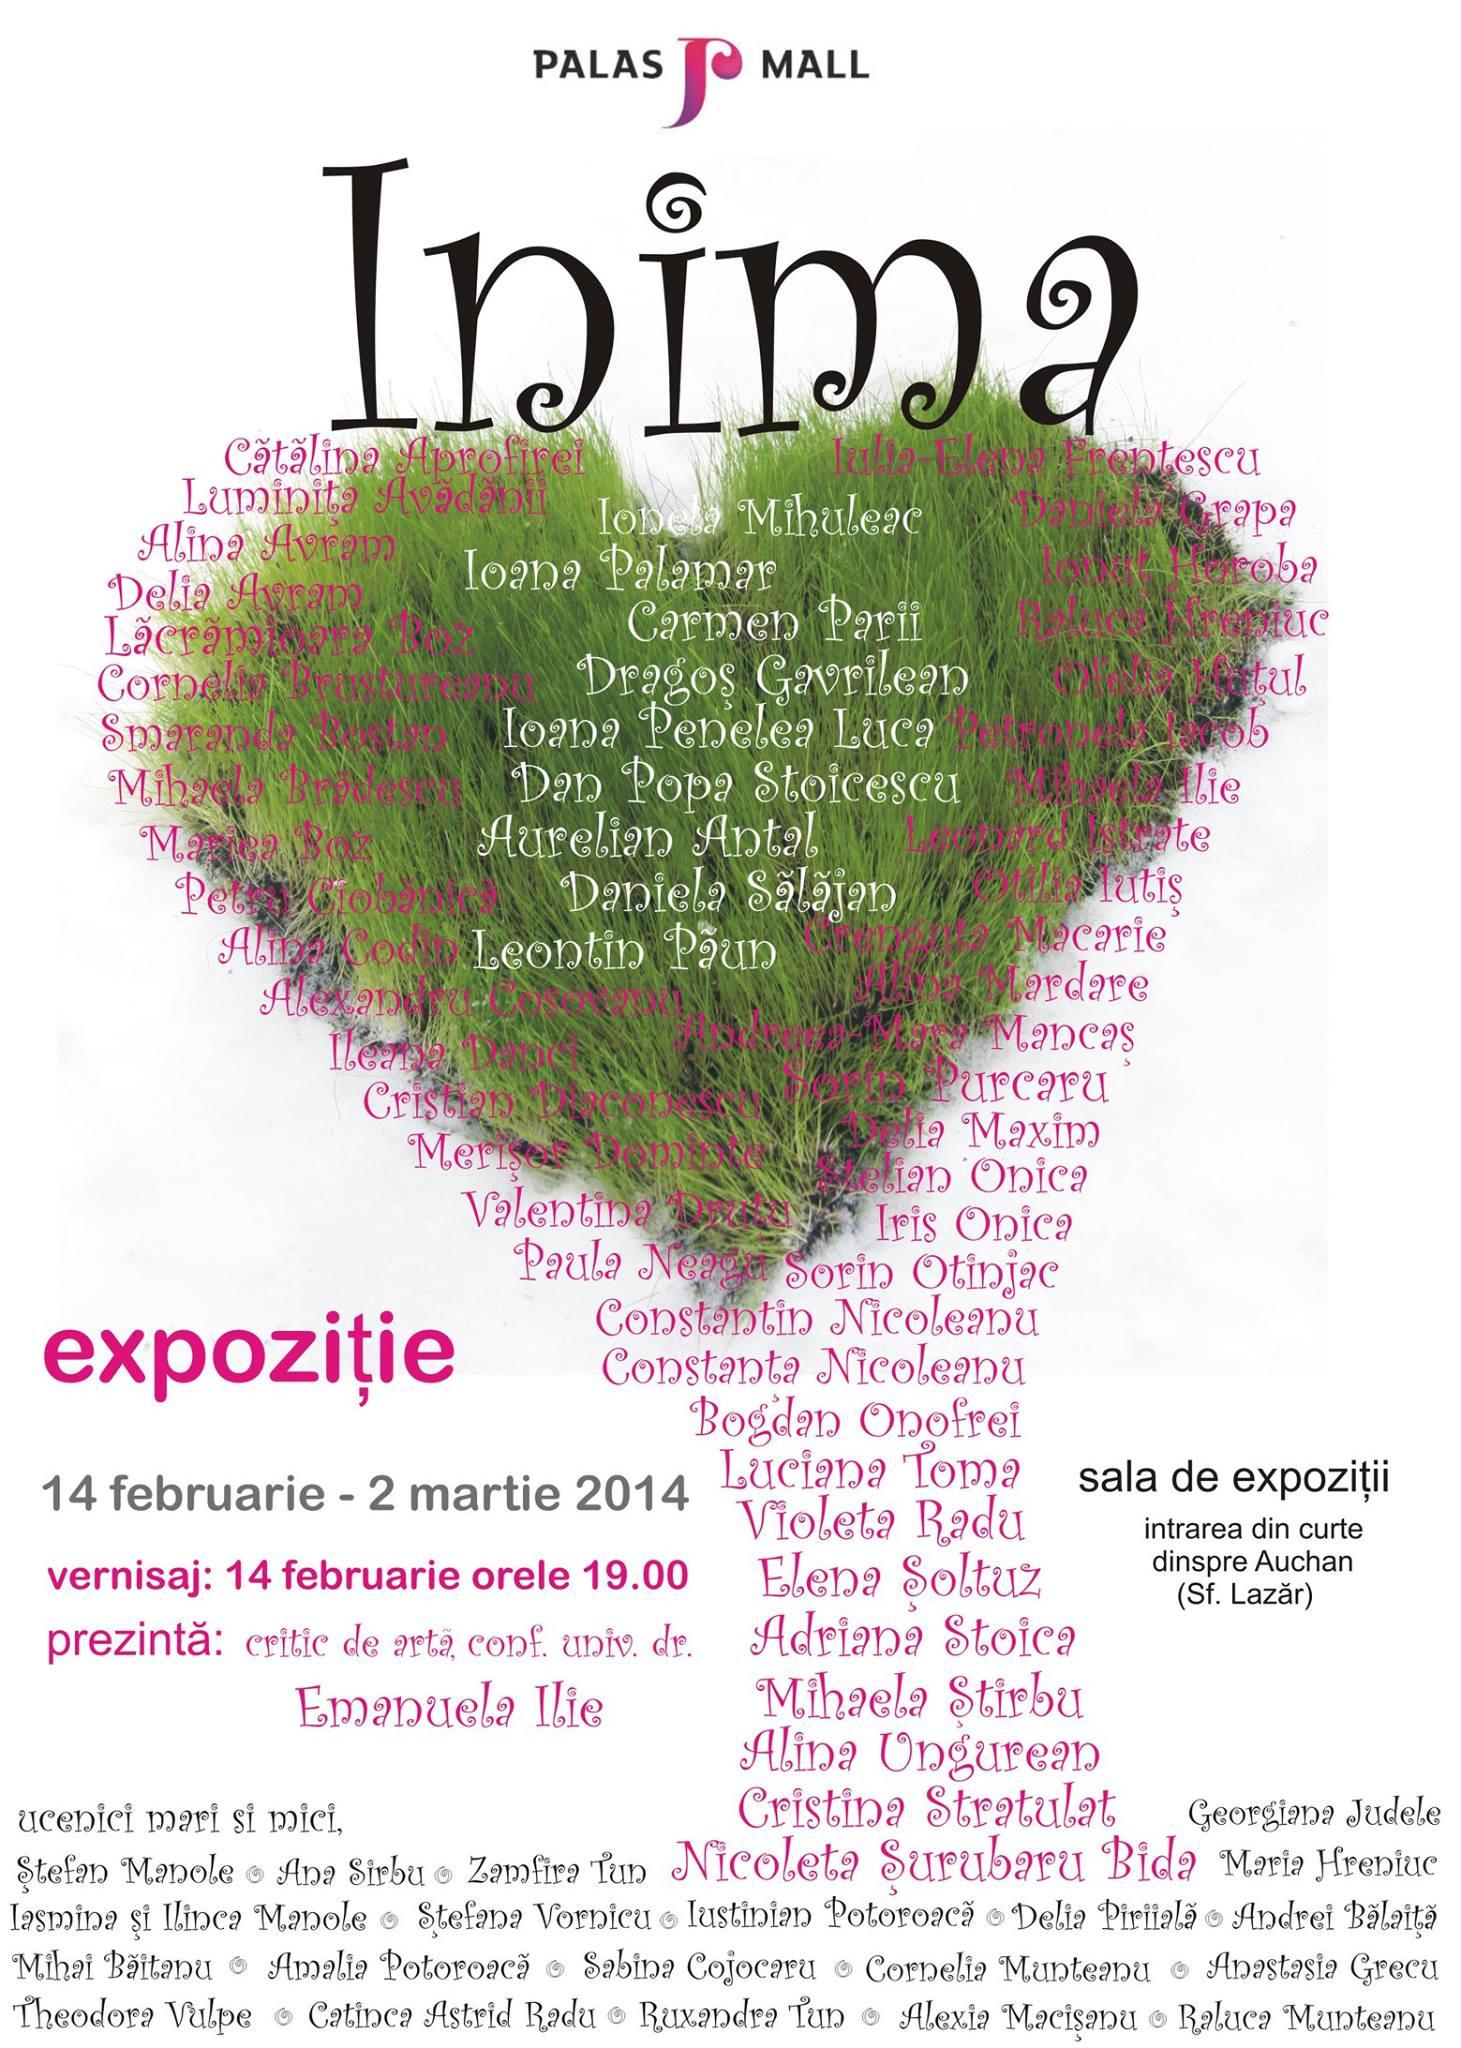 Expoziția INIMA, ediția a IV-a @ Palas Mall Iași